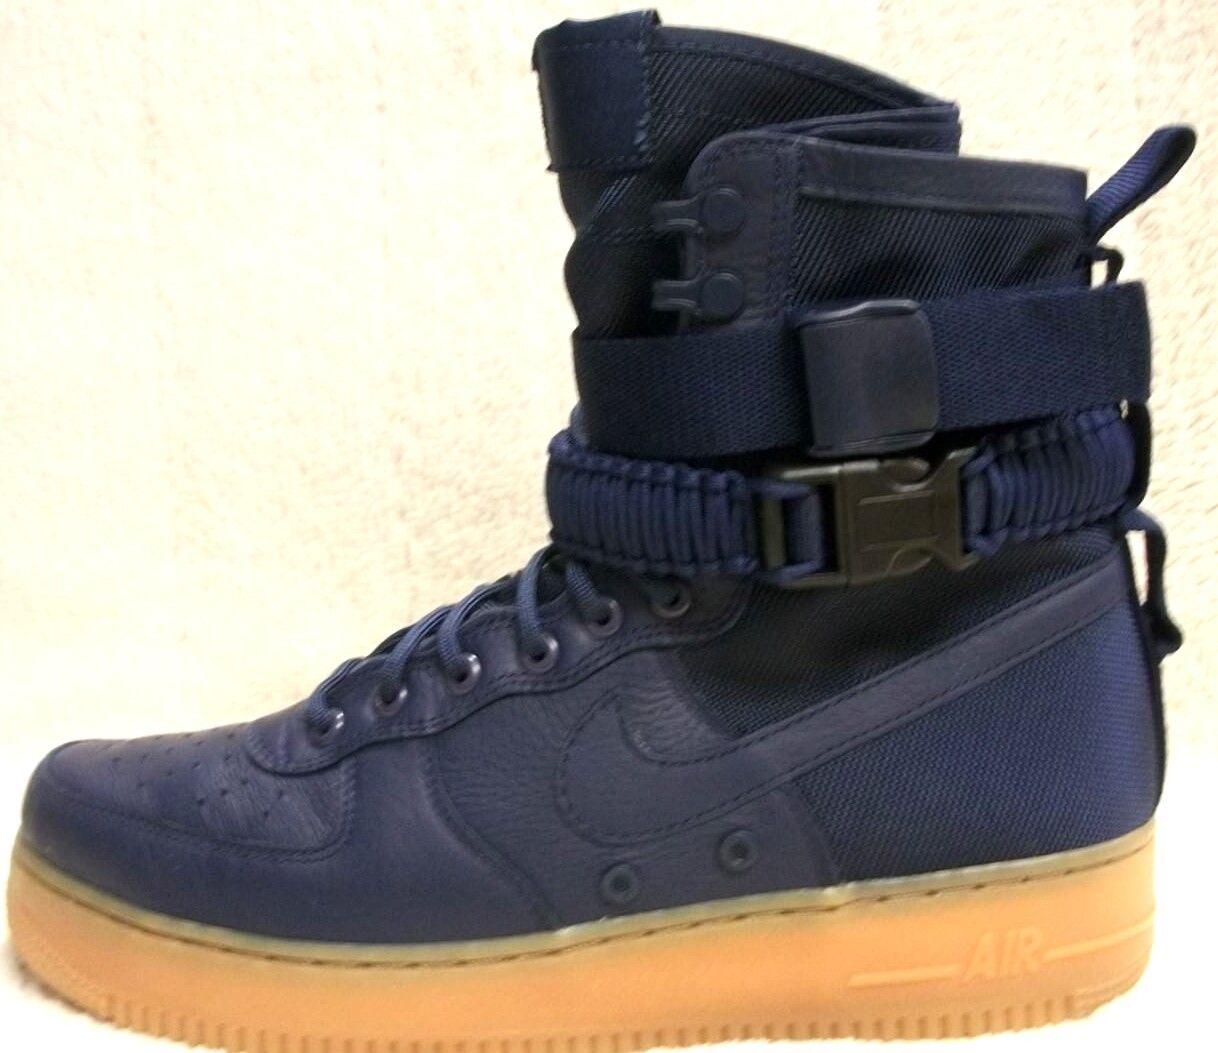 Nike SF AF1 864024 400 Midnight Navy Men's Size 10 Mfg Ret  180